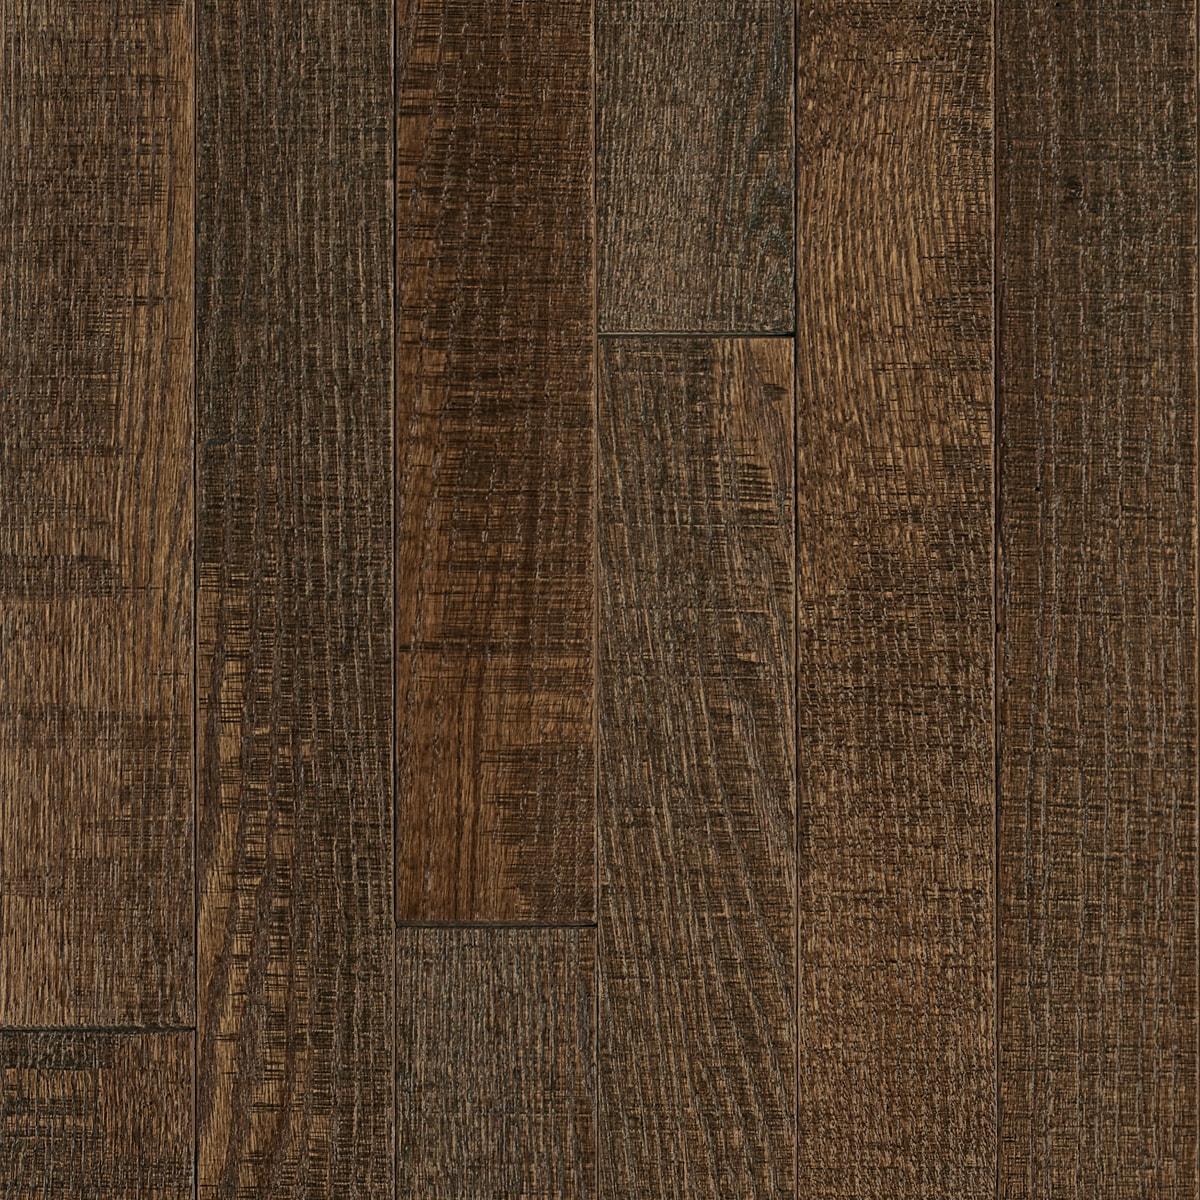 Randolph hardwood floor